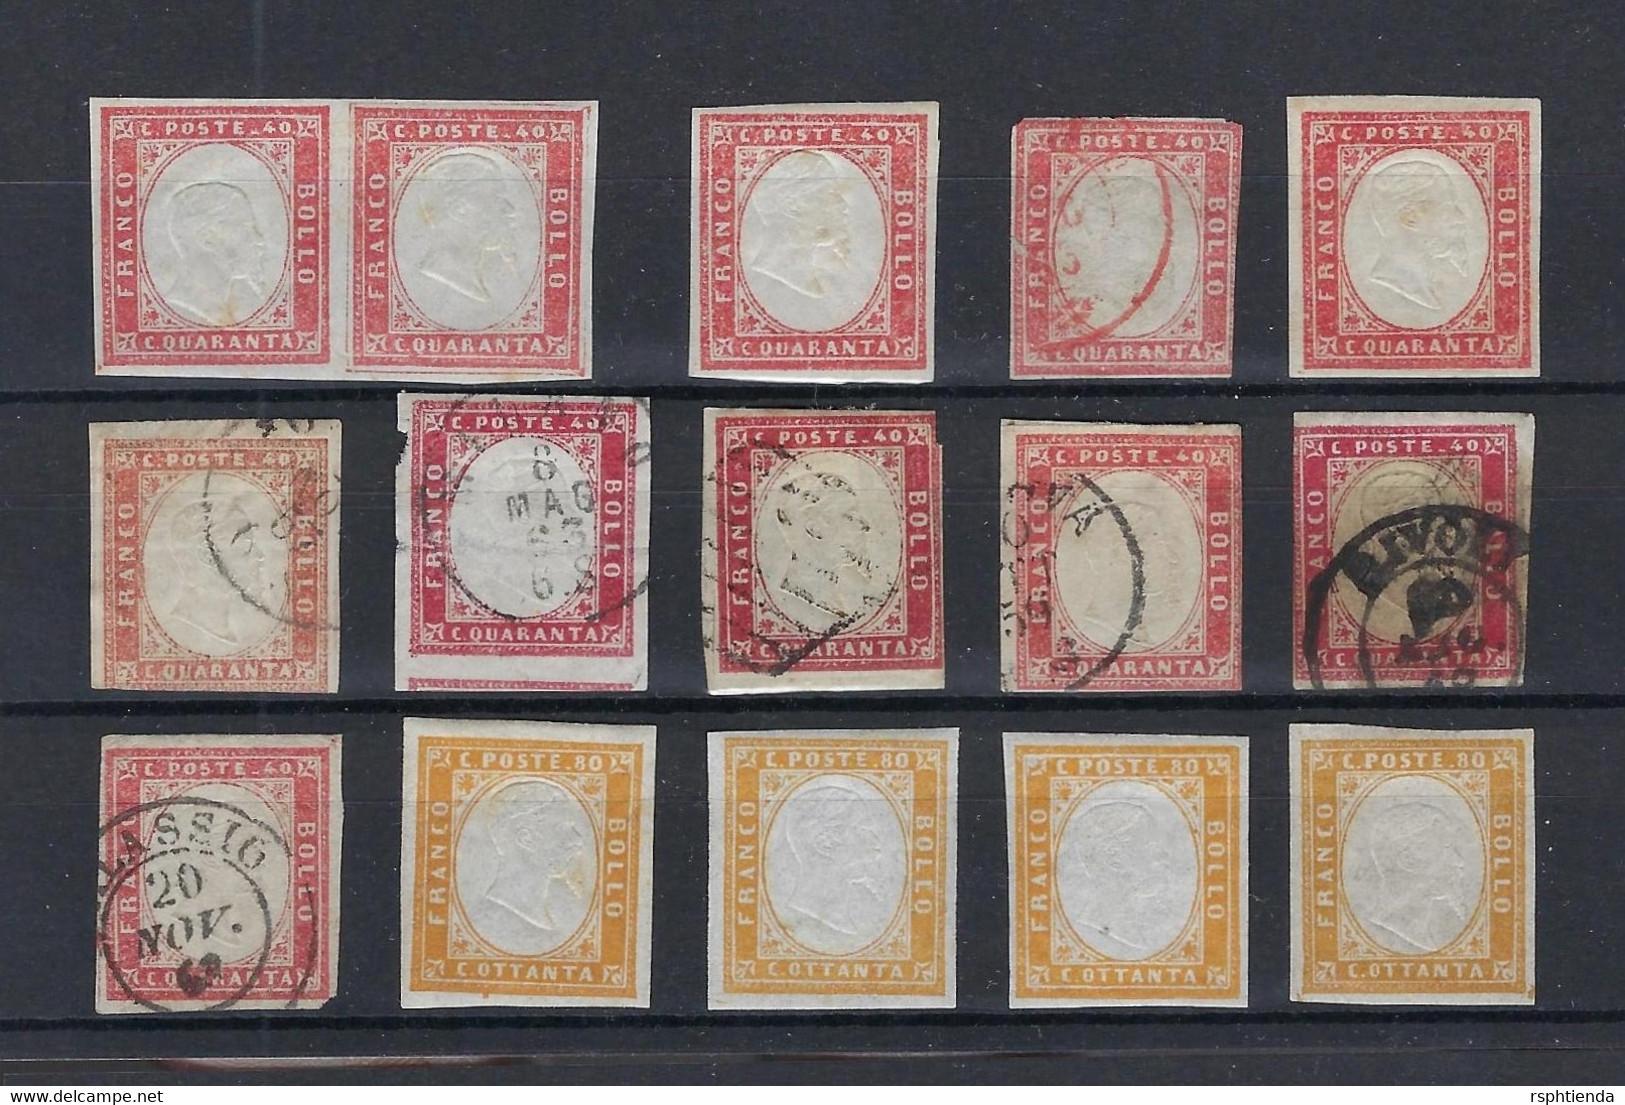 ITALY STATES 1852 TO 1961 NAPOLI , PARMA , SARDEGNA  STAMPS LOT HCV - Italy